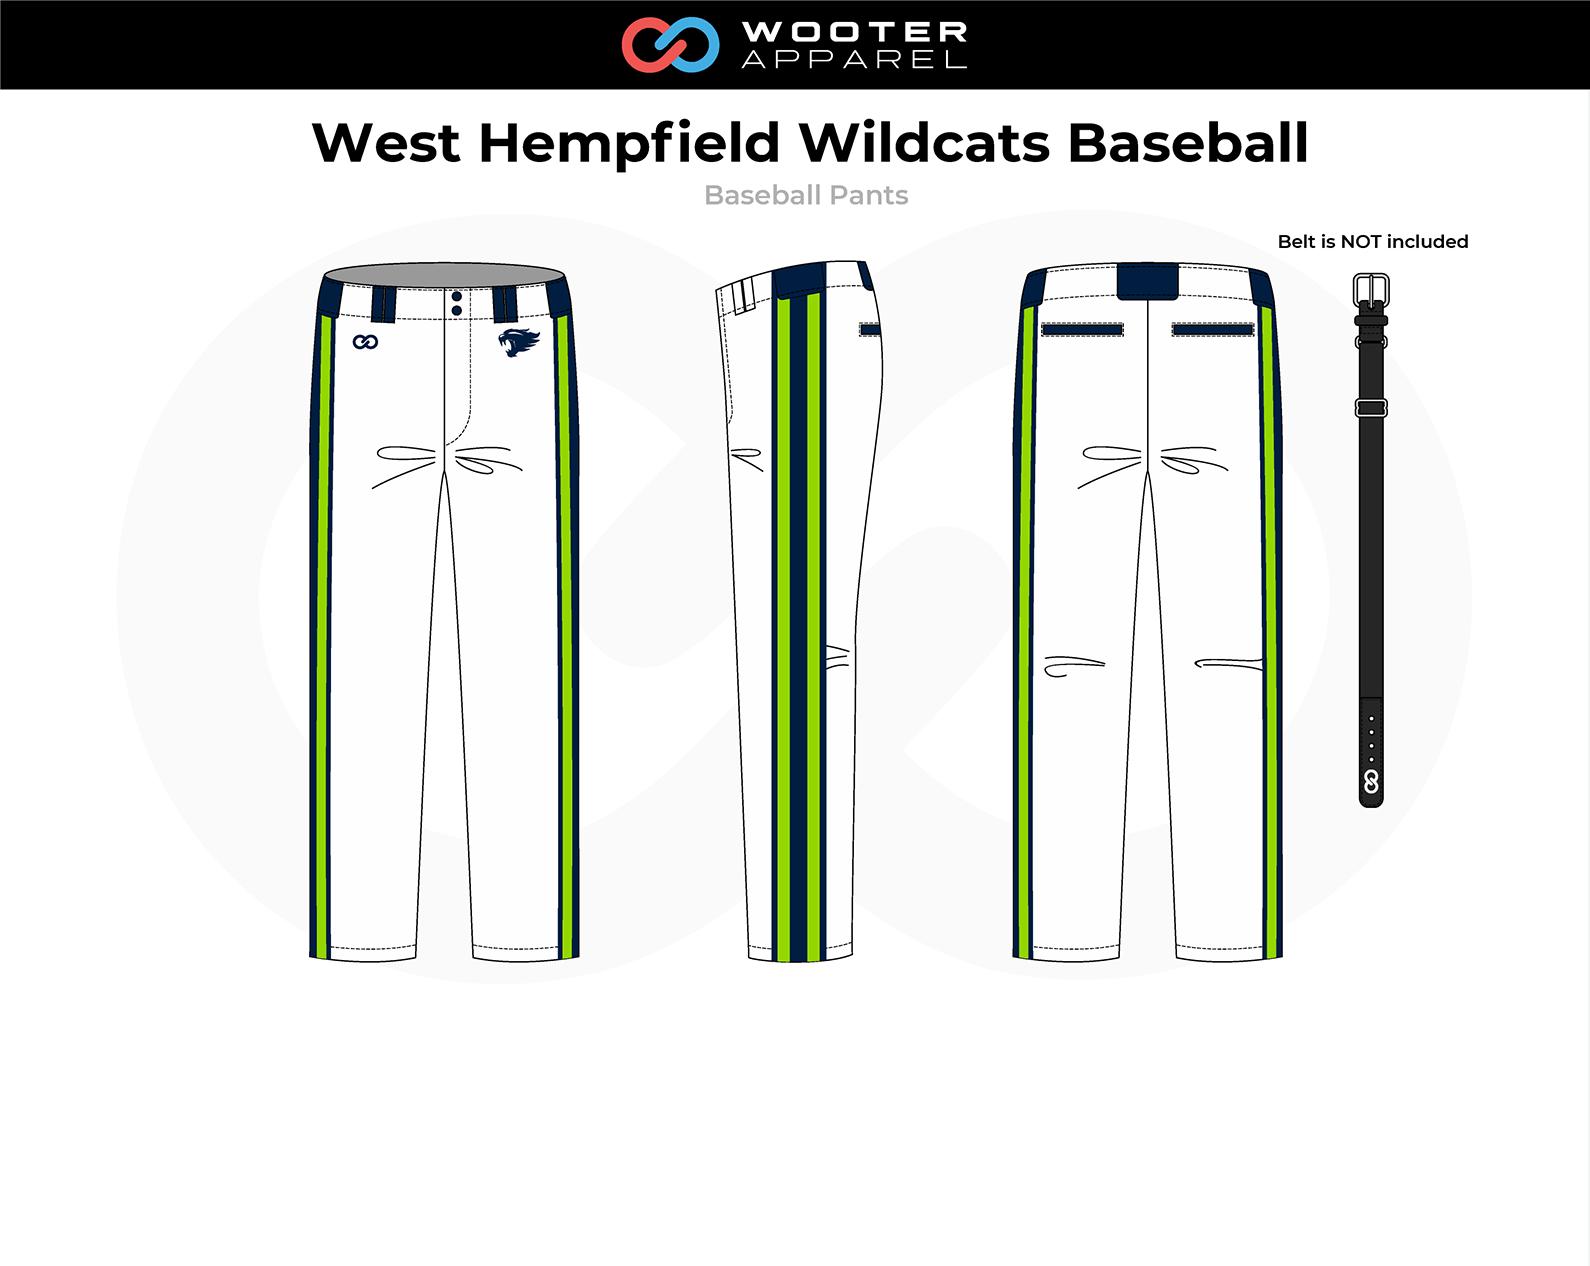 2018-11-06 West Hempfield Wildcats Baseball Pants (White).png